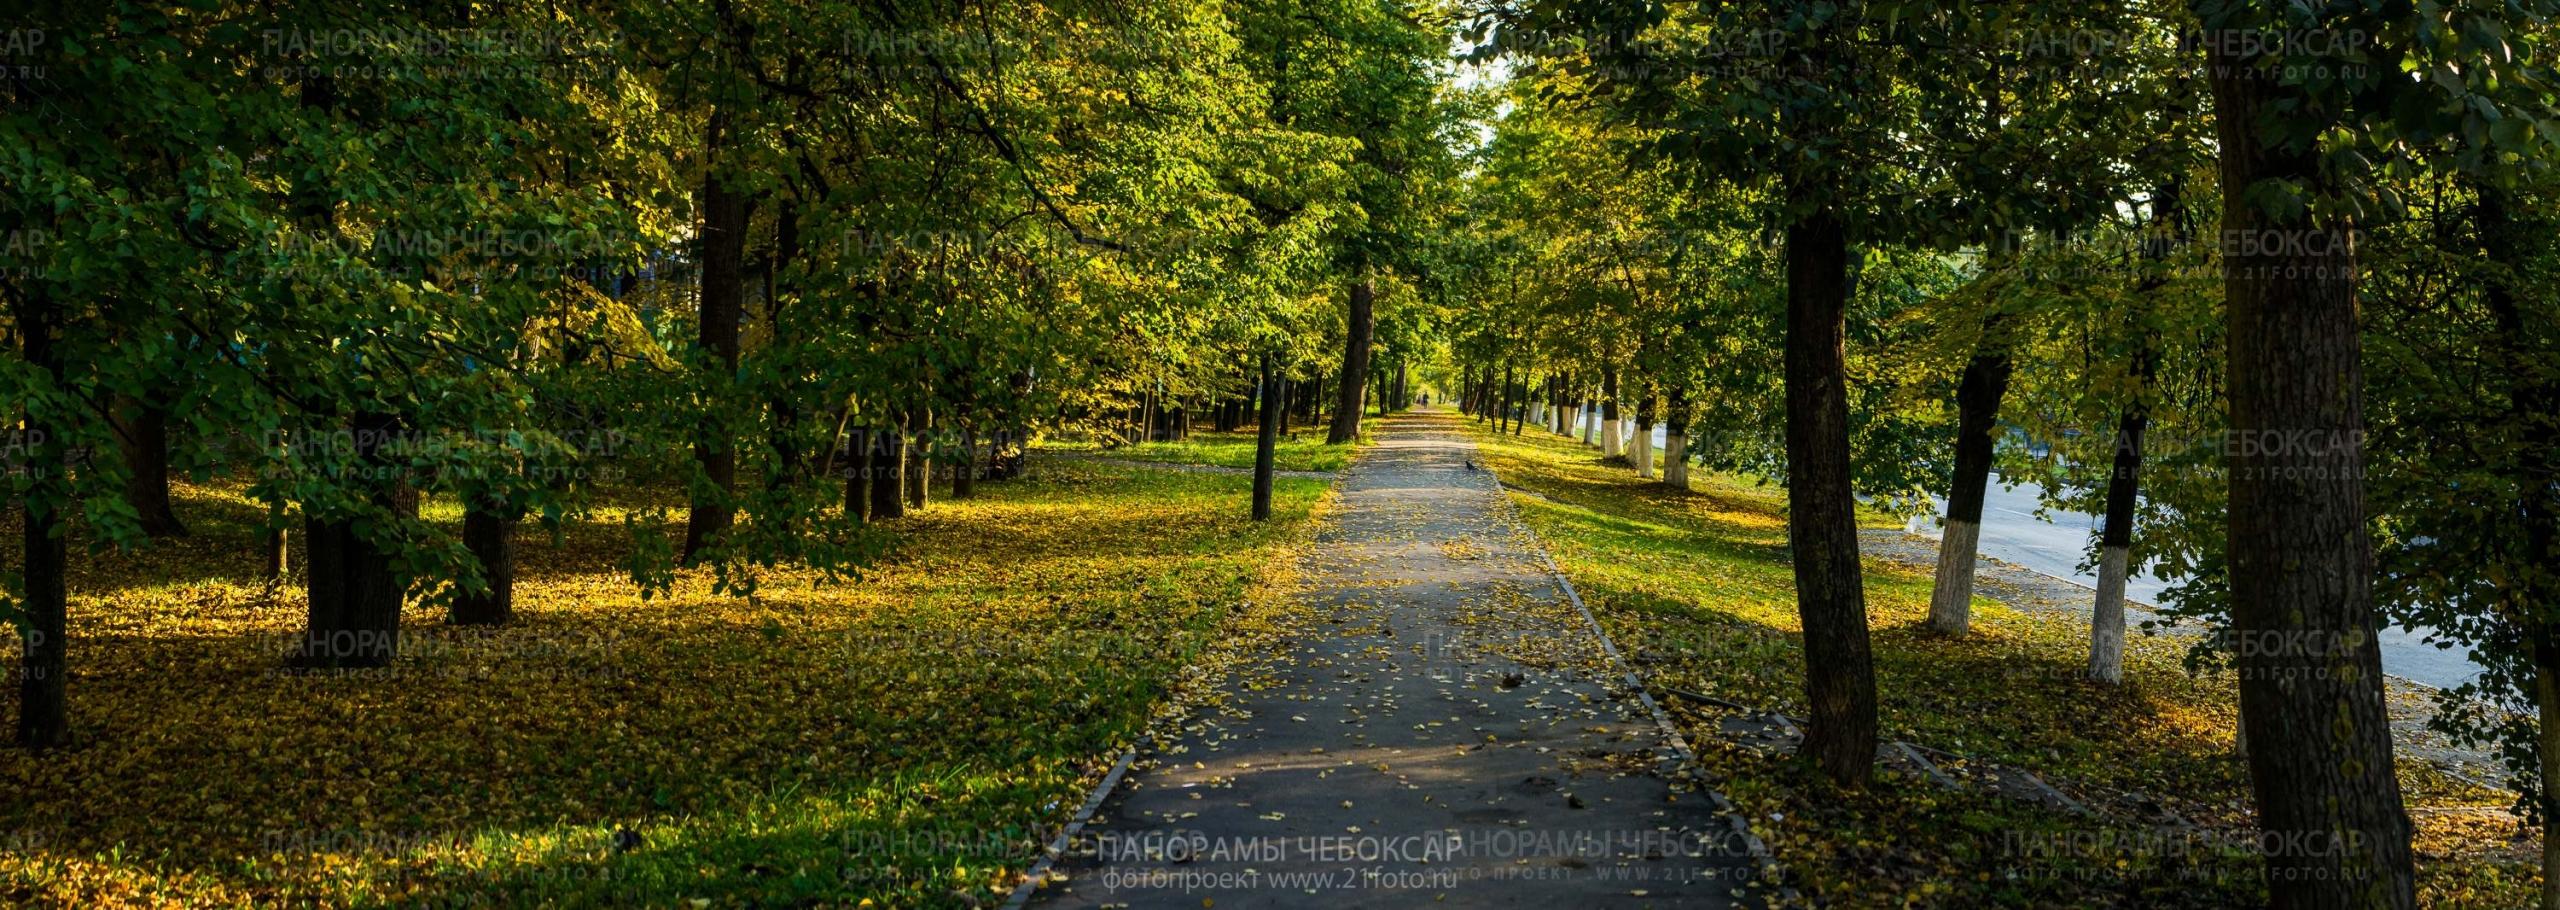 Осень на Московском Проспекте